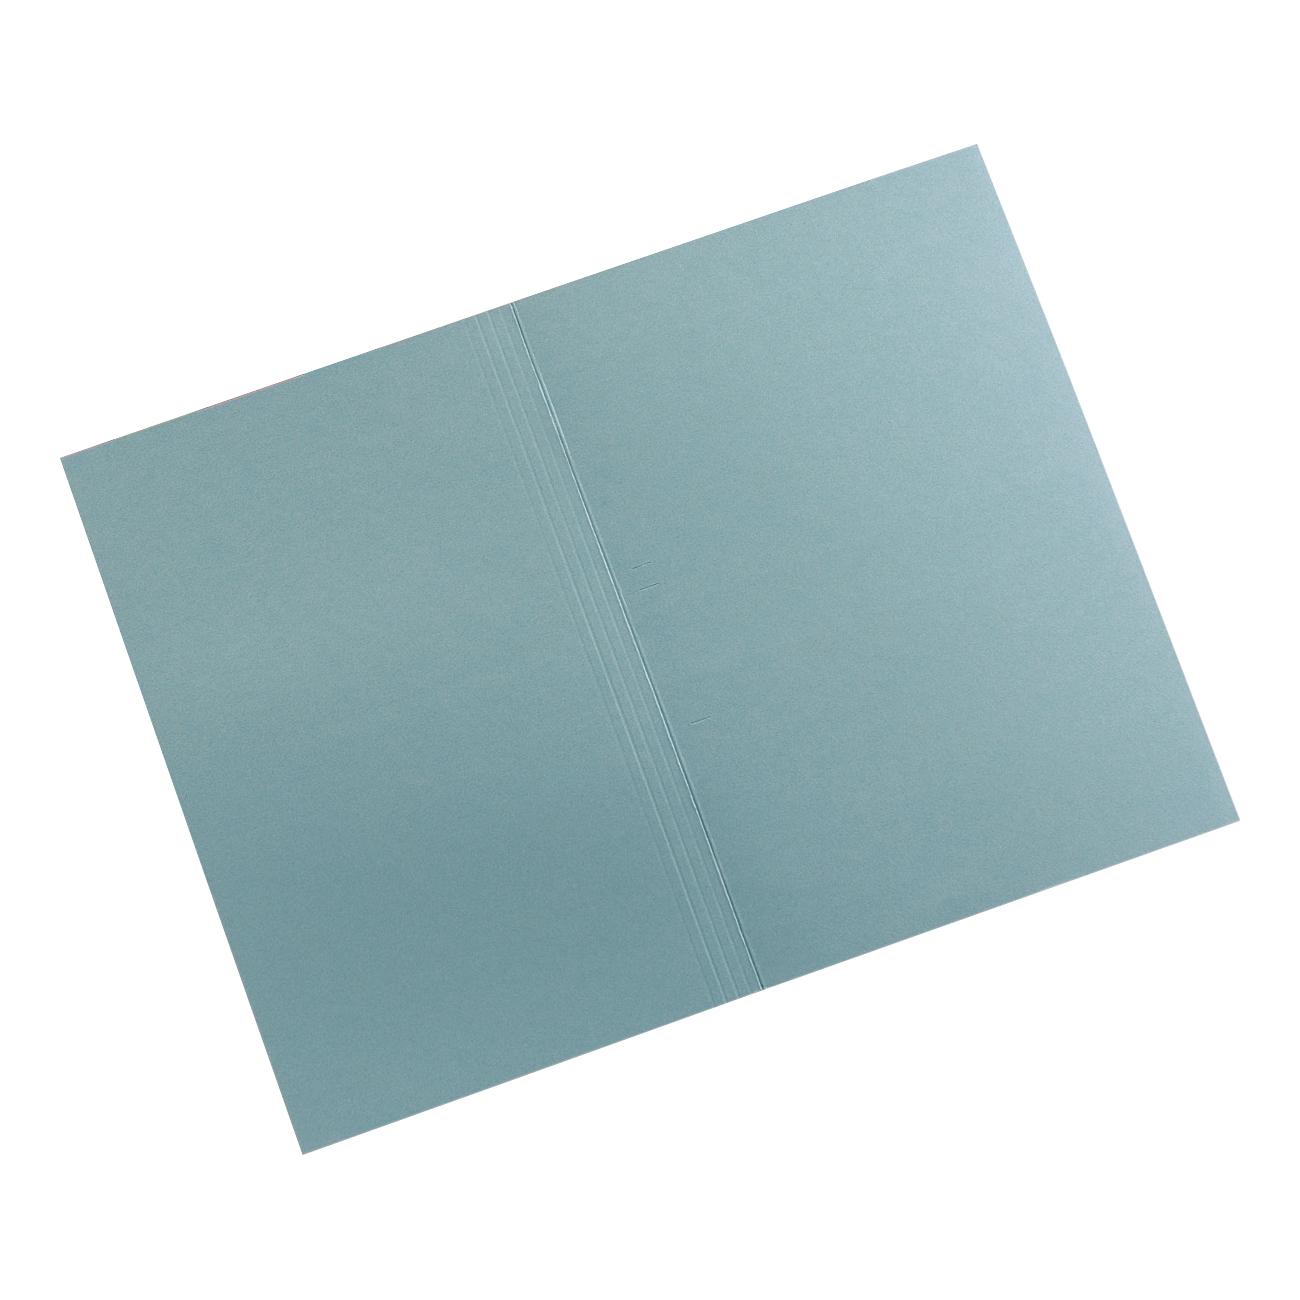 Invo Square Cut Folders Manilla 315gsm Foolscap Blue Pack 100